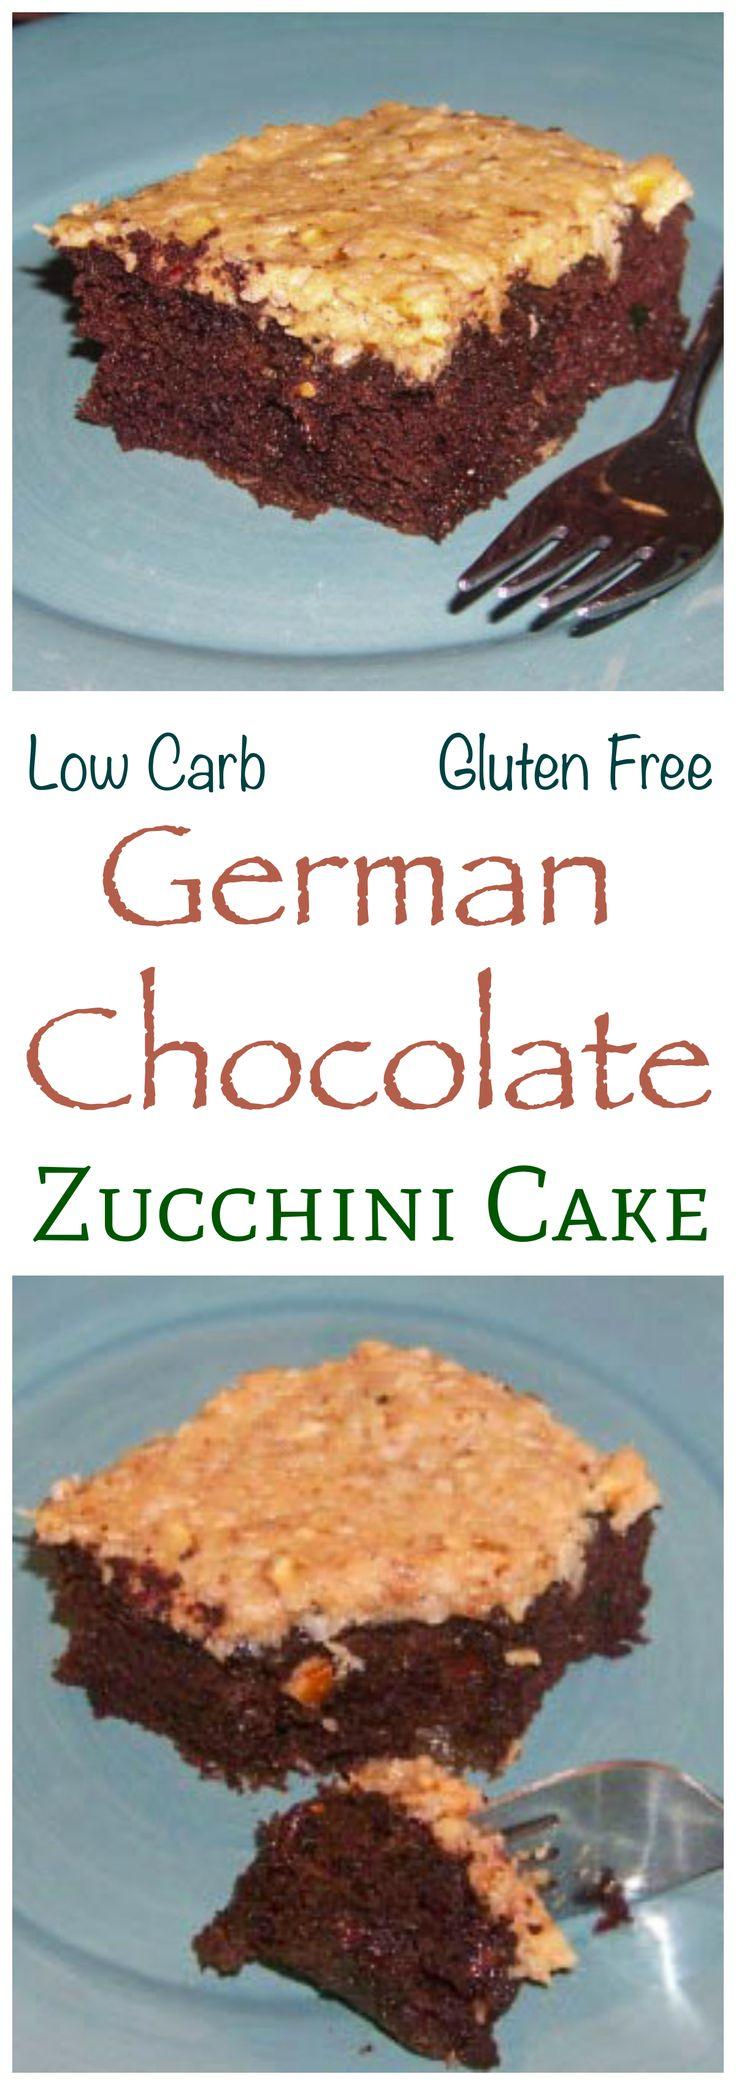 Splenda zucchini cake recipe